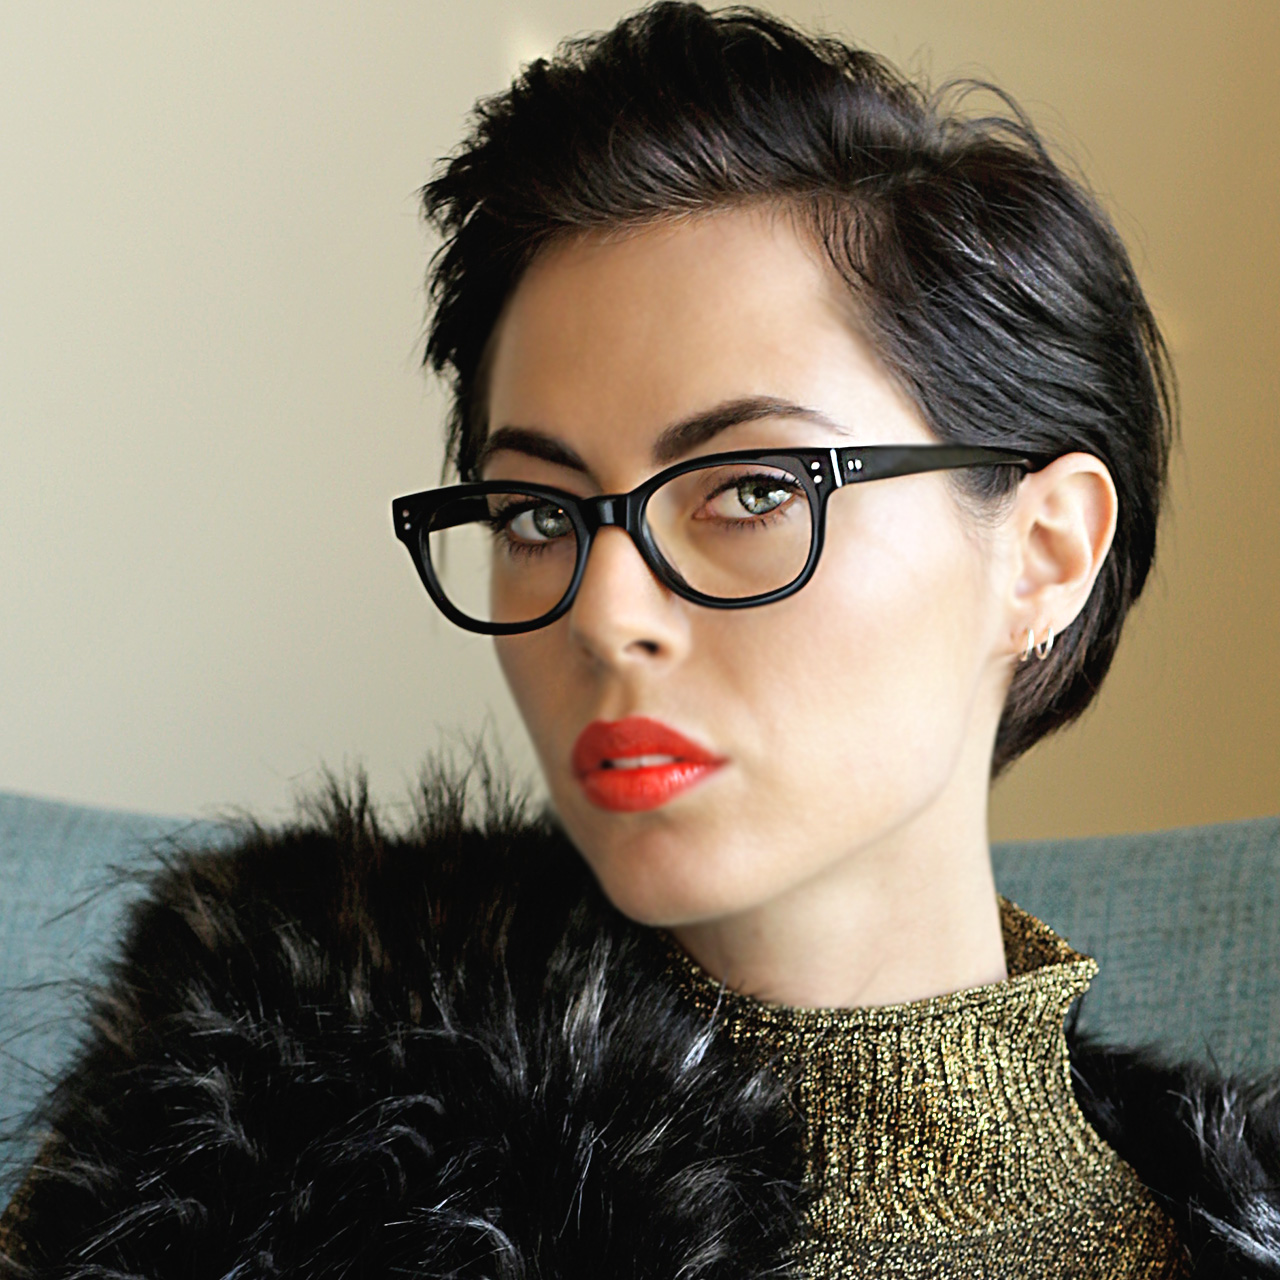 geek-401-geek-eyewear-taylor.jpg